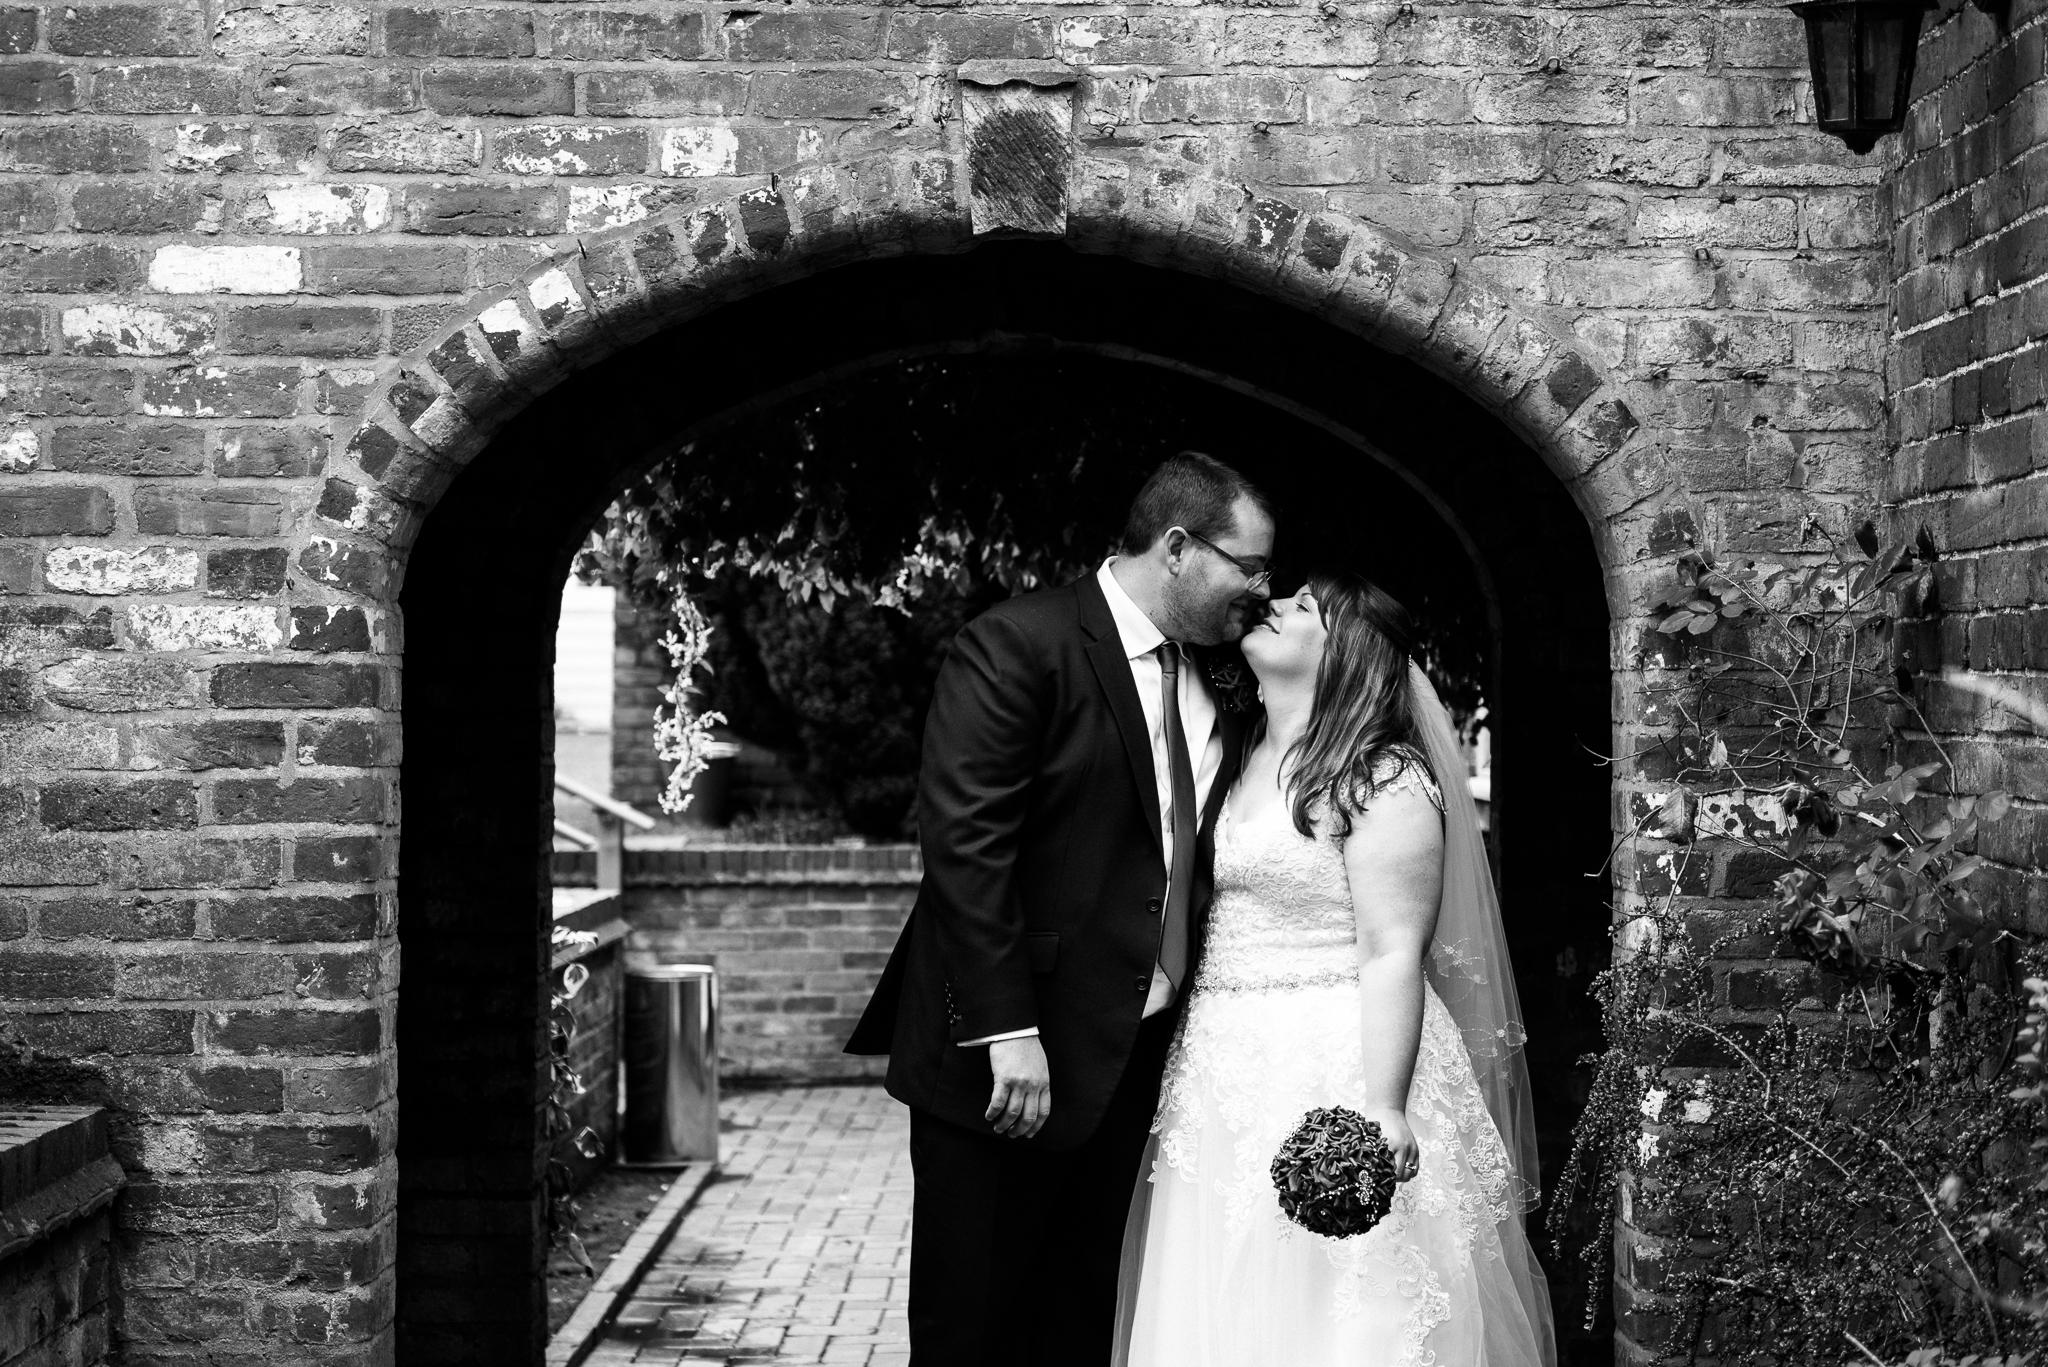 Geek Lego Wedding at Slater's County Inn, Baldwin's Gate, Staffordshire-25.jpg